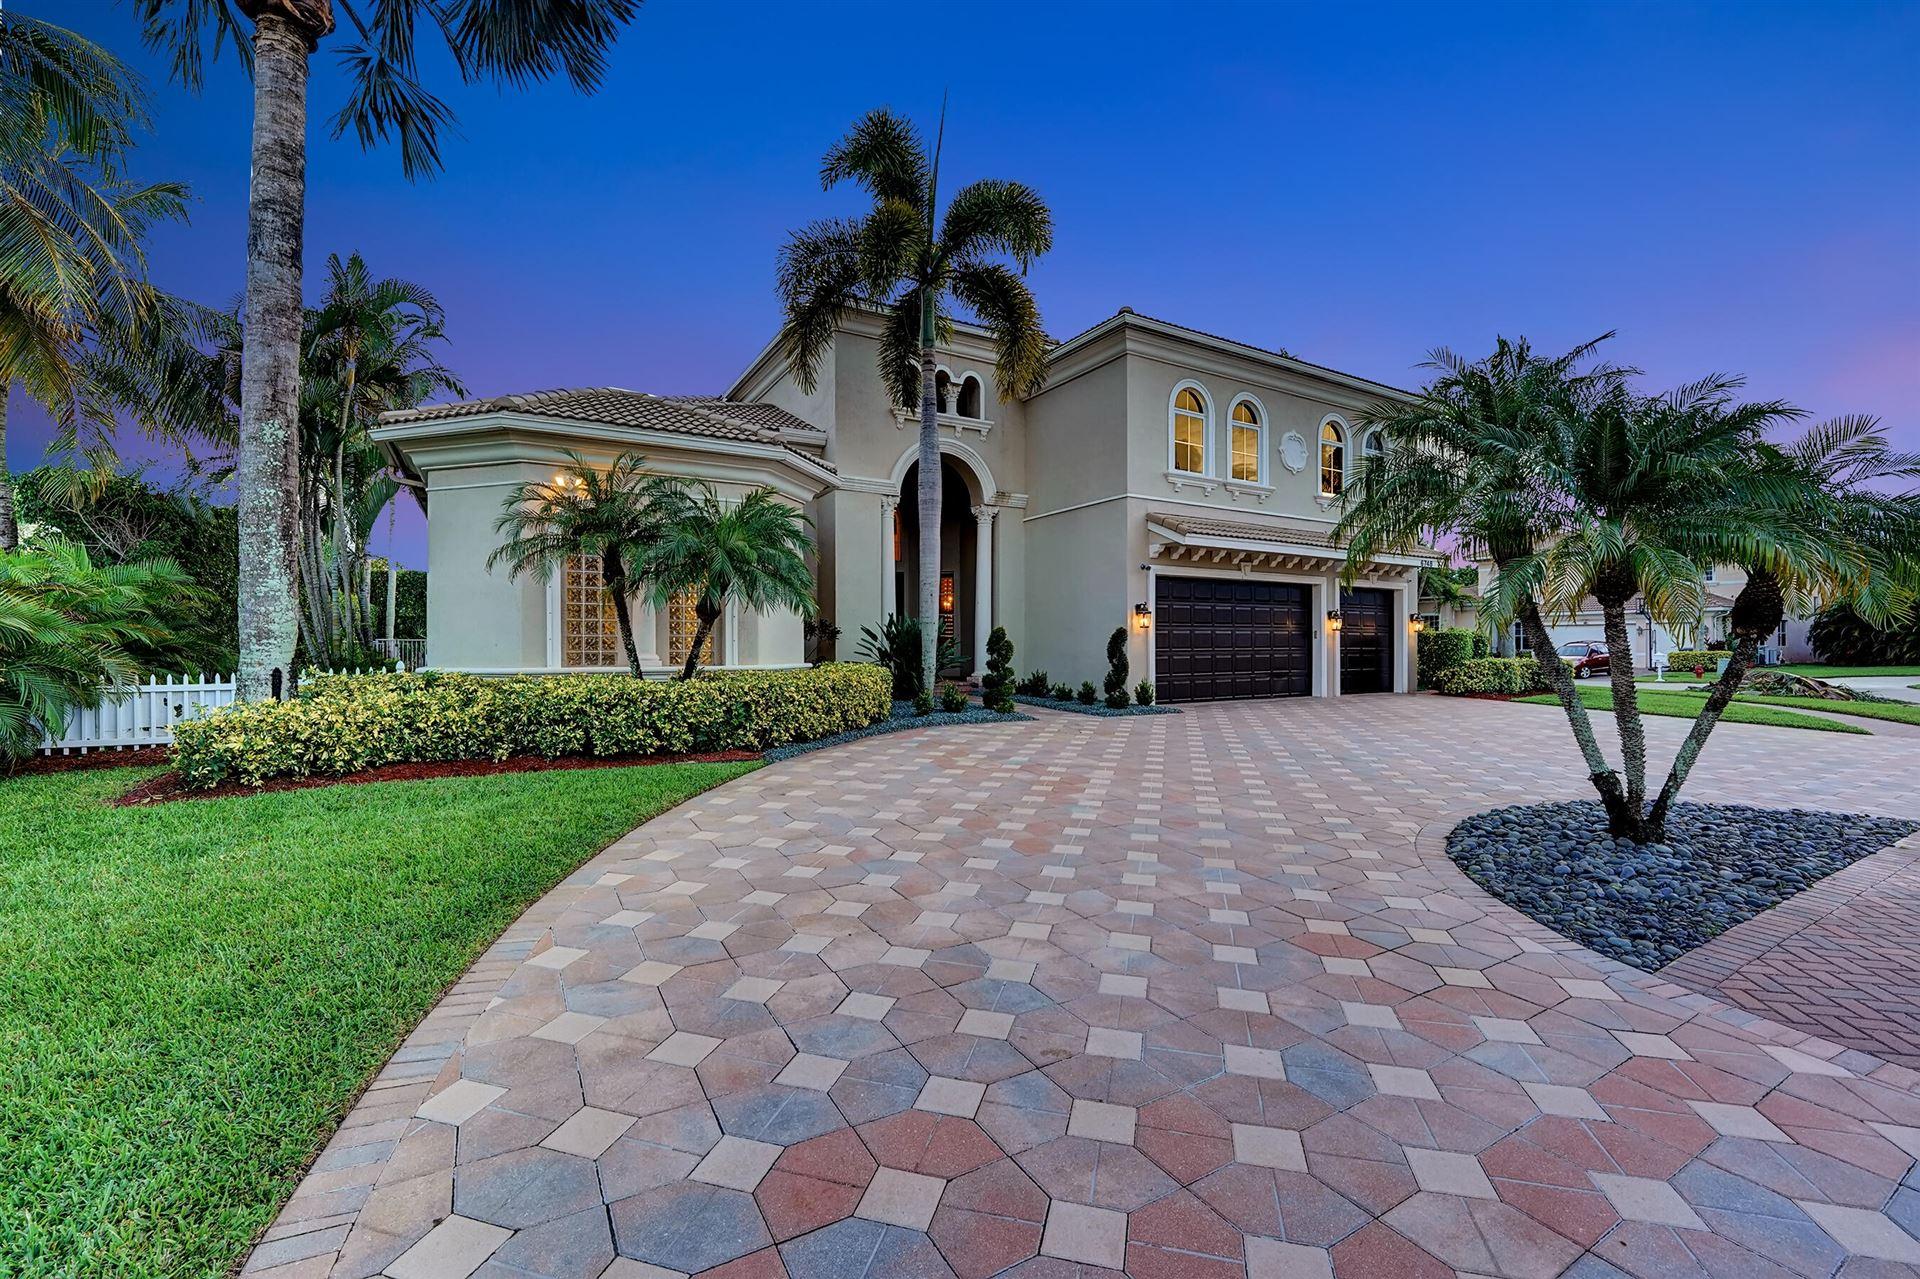 6748 Cobia Circle, Boynton Beach, FL 33437 - MLS#: RX-10745053